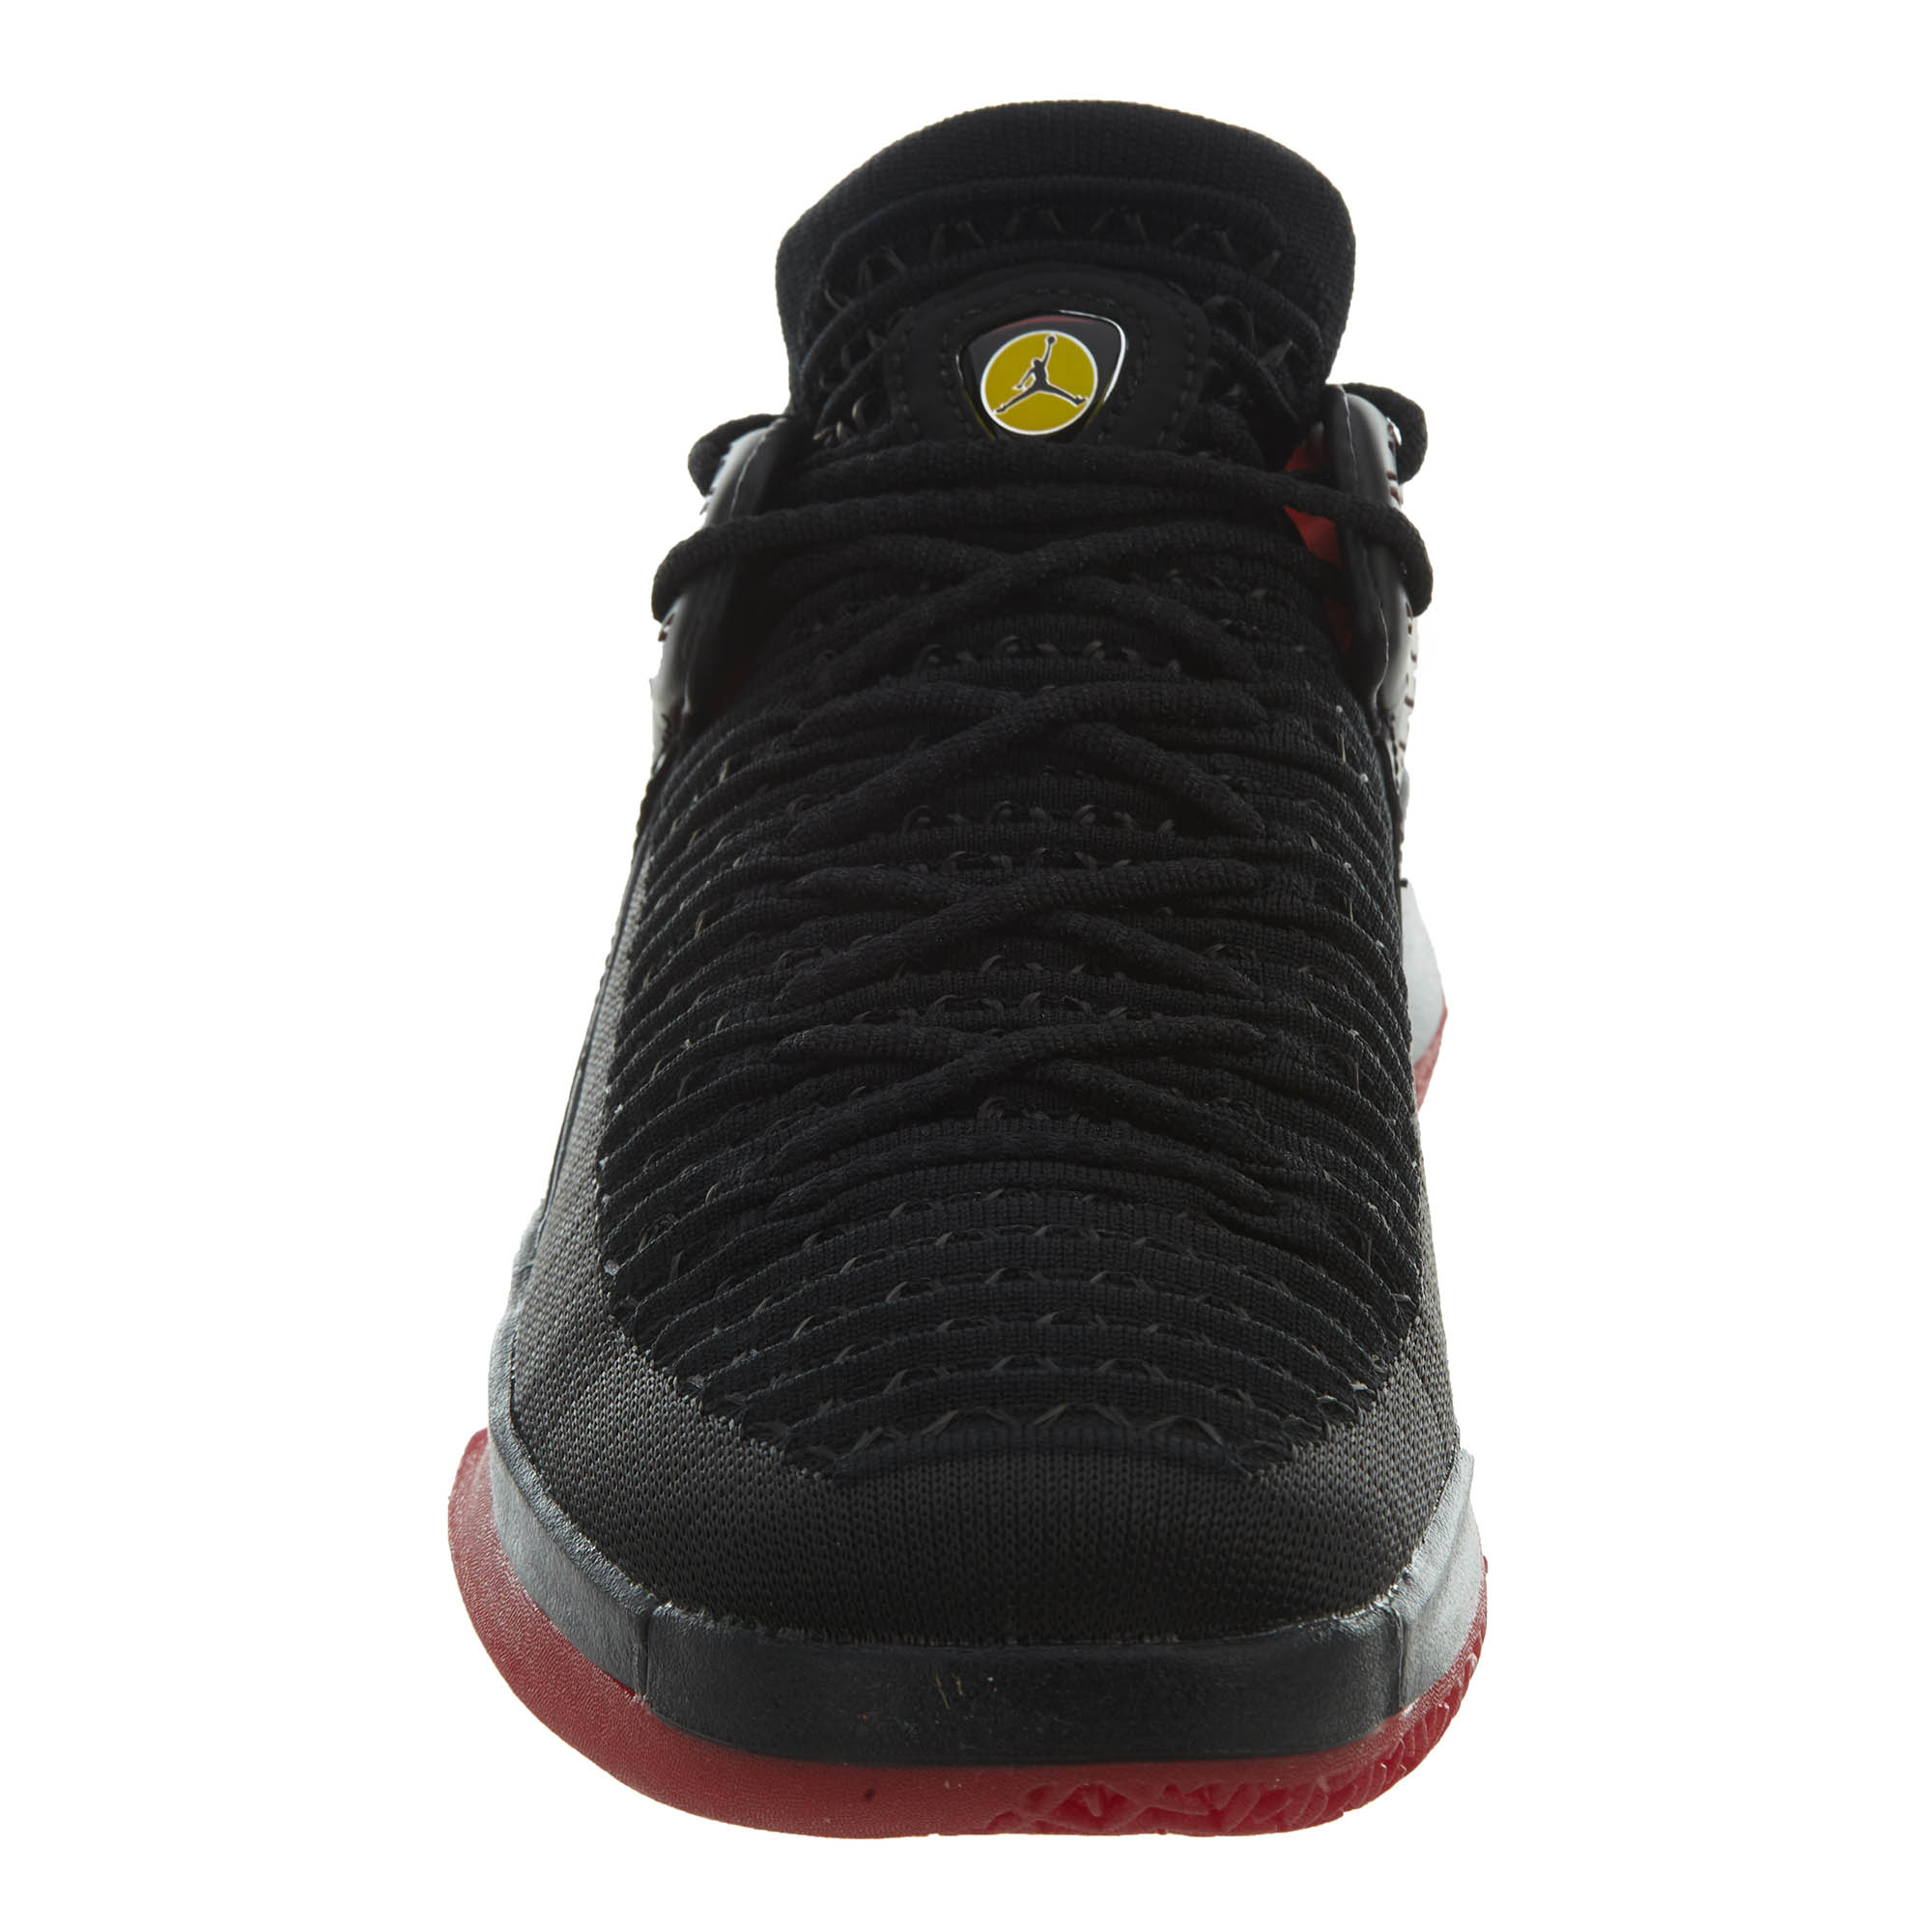 10619ac5f73 Nike - jordan kids' grade school air jordan xxxii low basketball shoes -  Walmart.com